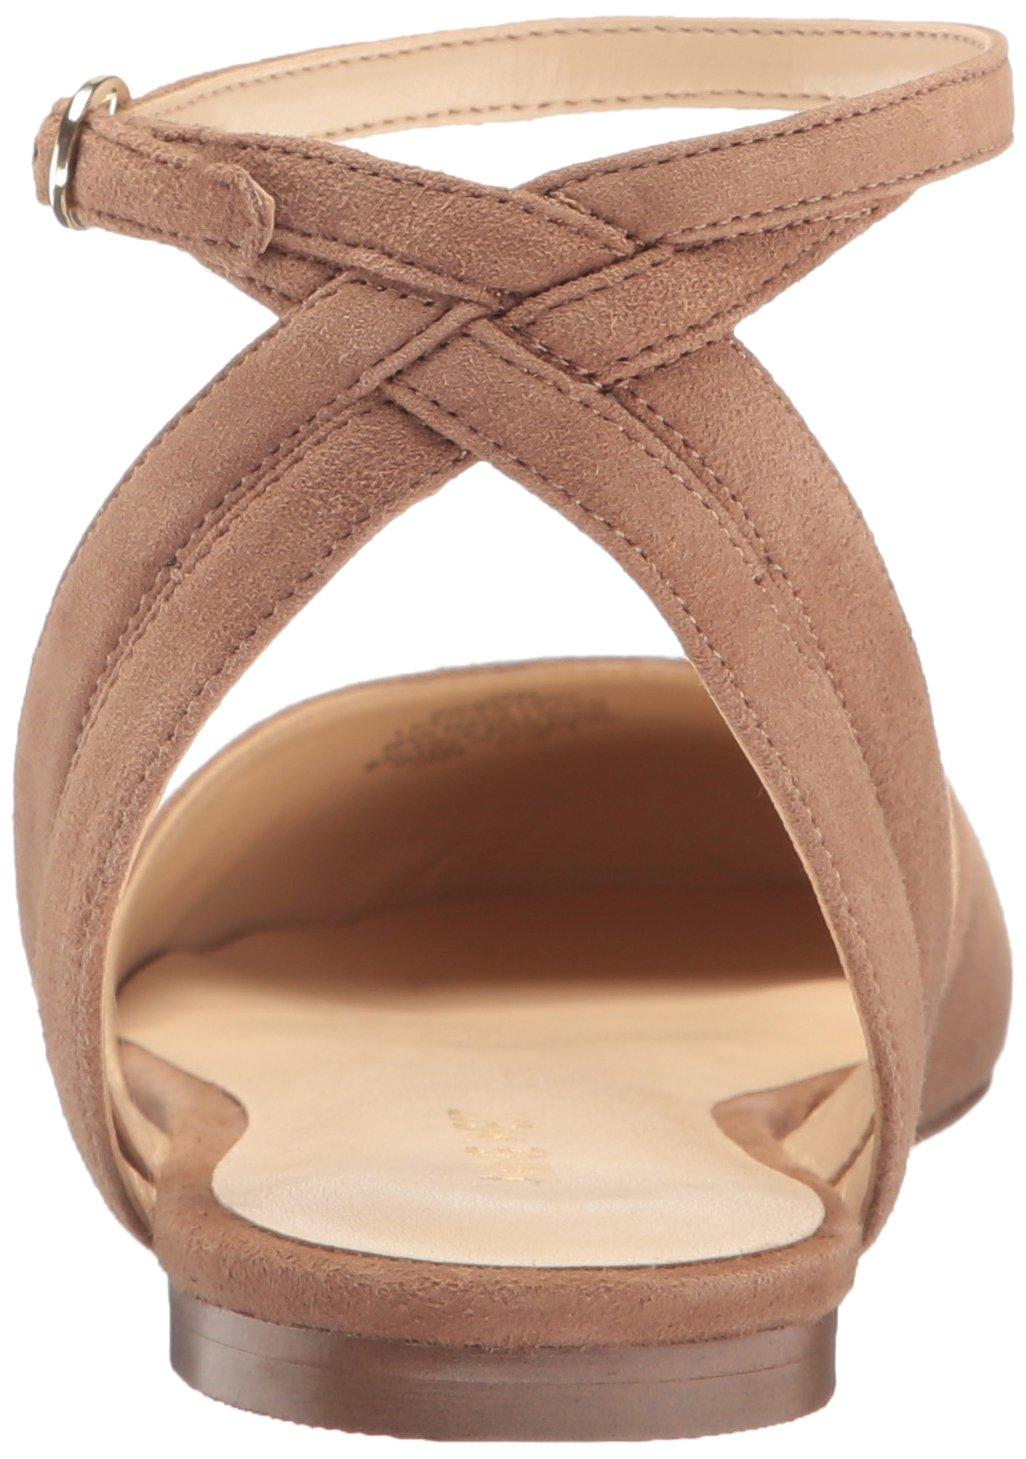 Nine West Women's Begany Suede Ballet Flat B01MSWV21K 8 B(M) US Natural